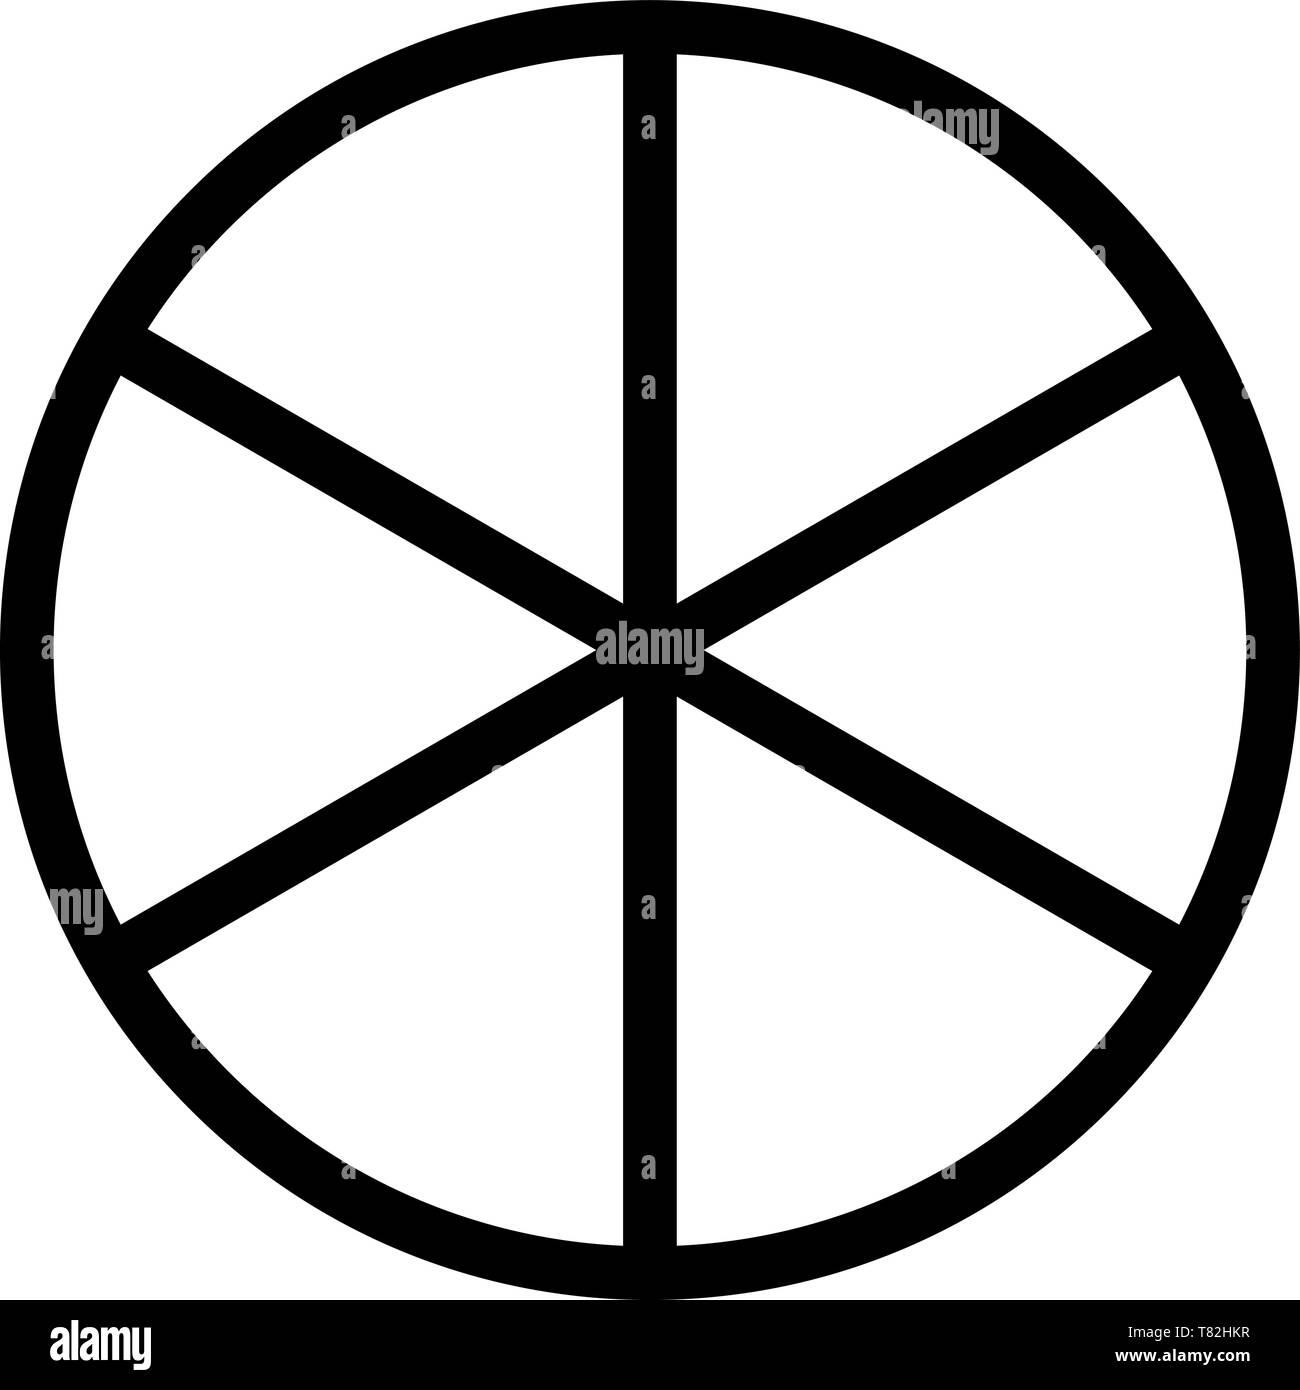 sun wheel mandala circle of life order symbol fate cycle rebirth - Stock Vector